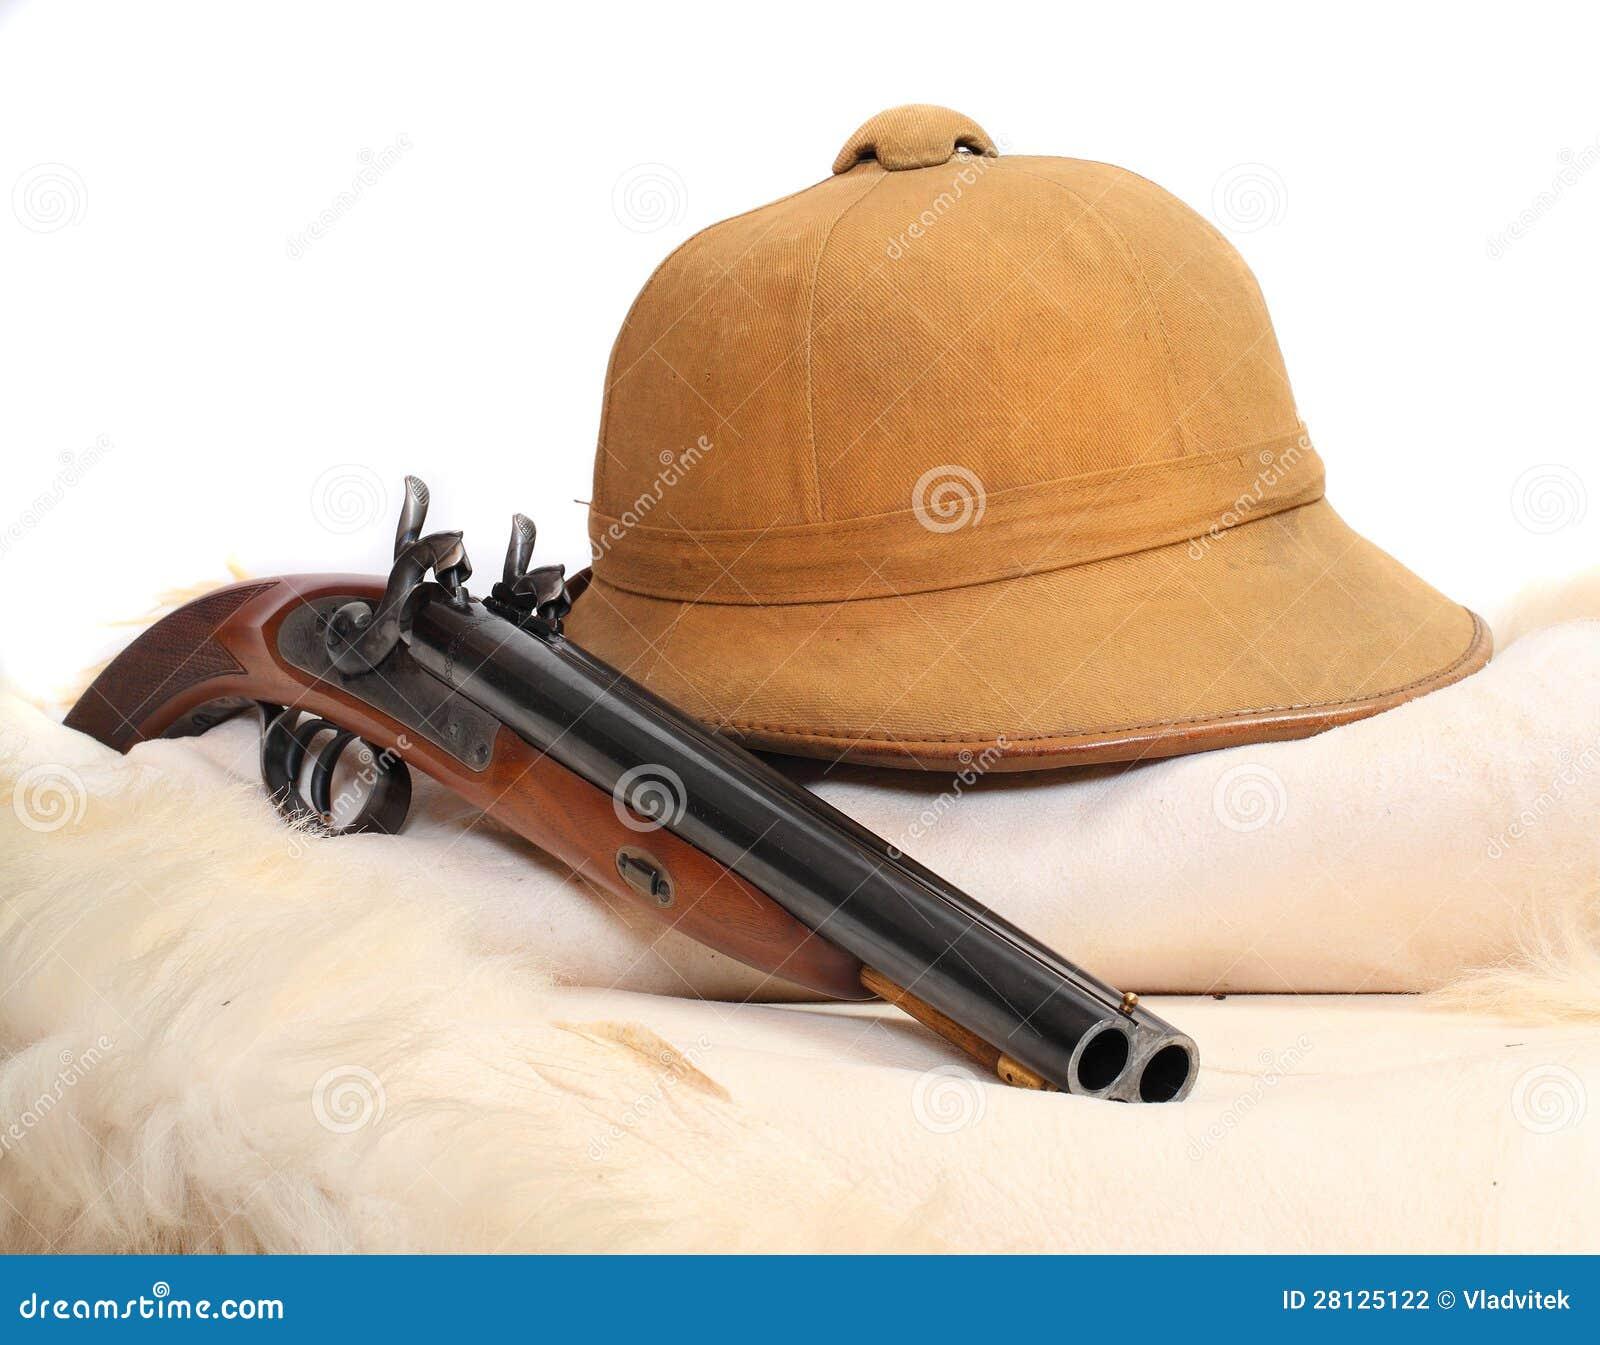 ... for safari hunters. Tropical cork helmet and big pistol on a animal